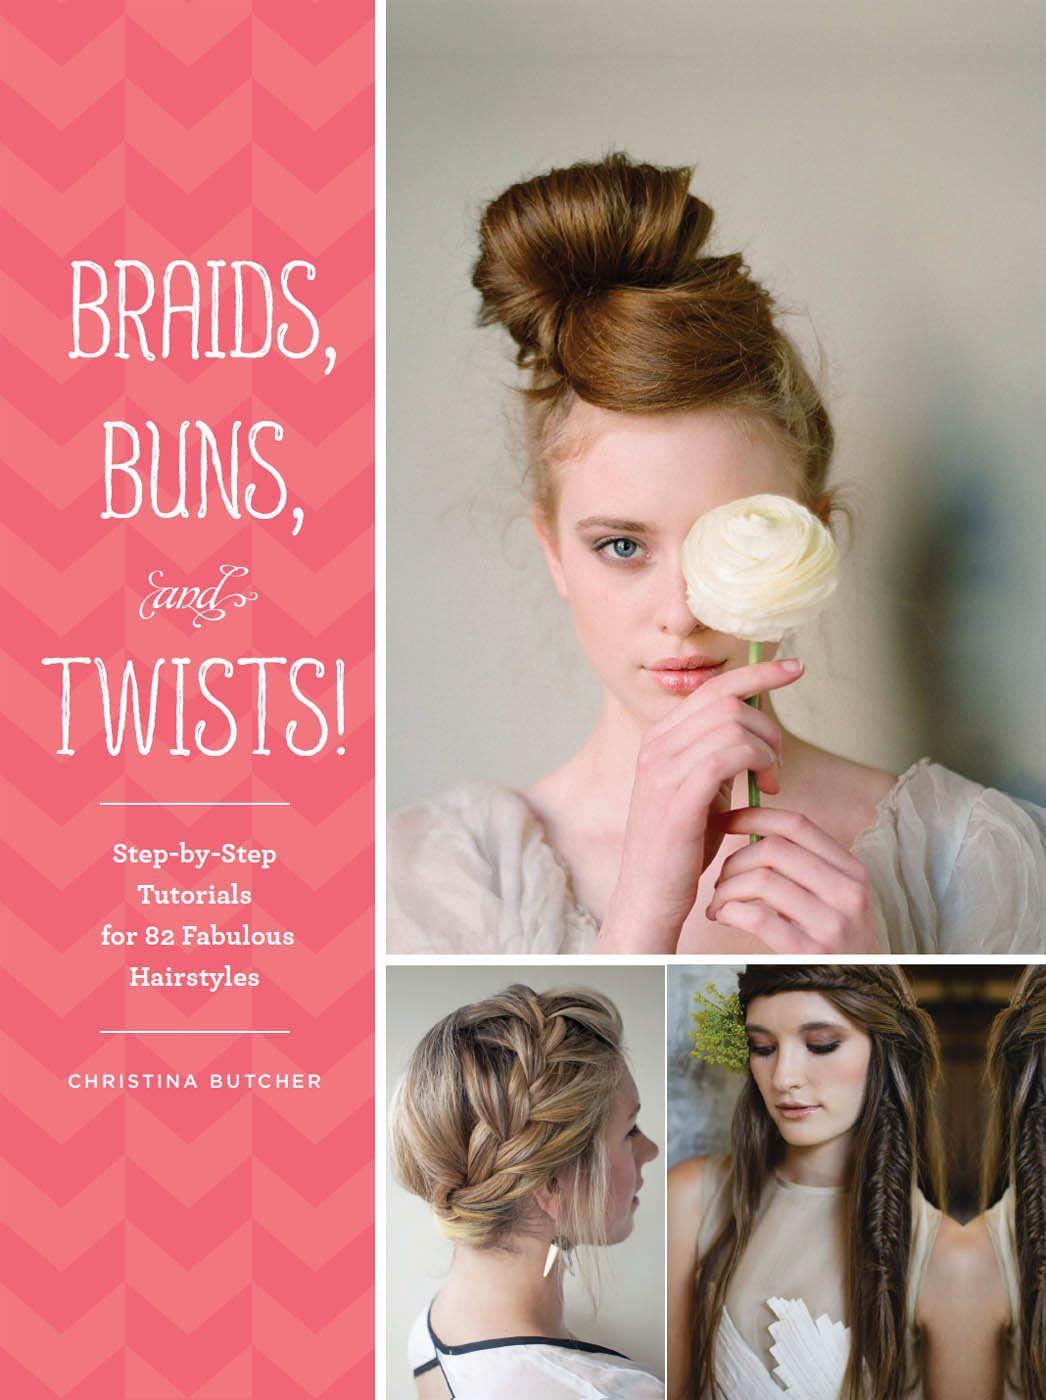 step hairstyles braids twists buns tutorials braid fabulous hairstyle